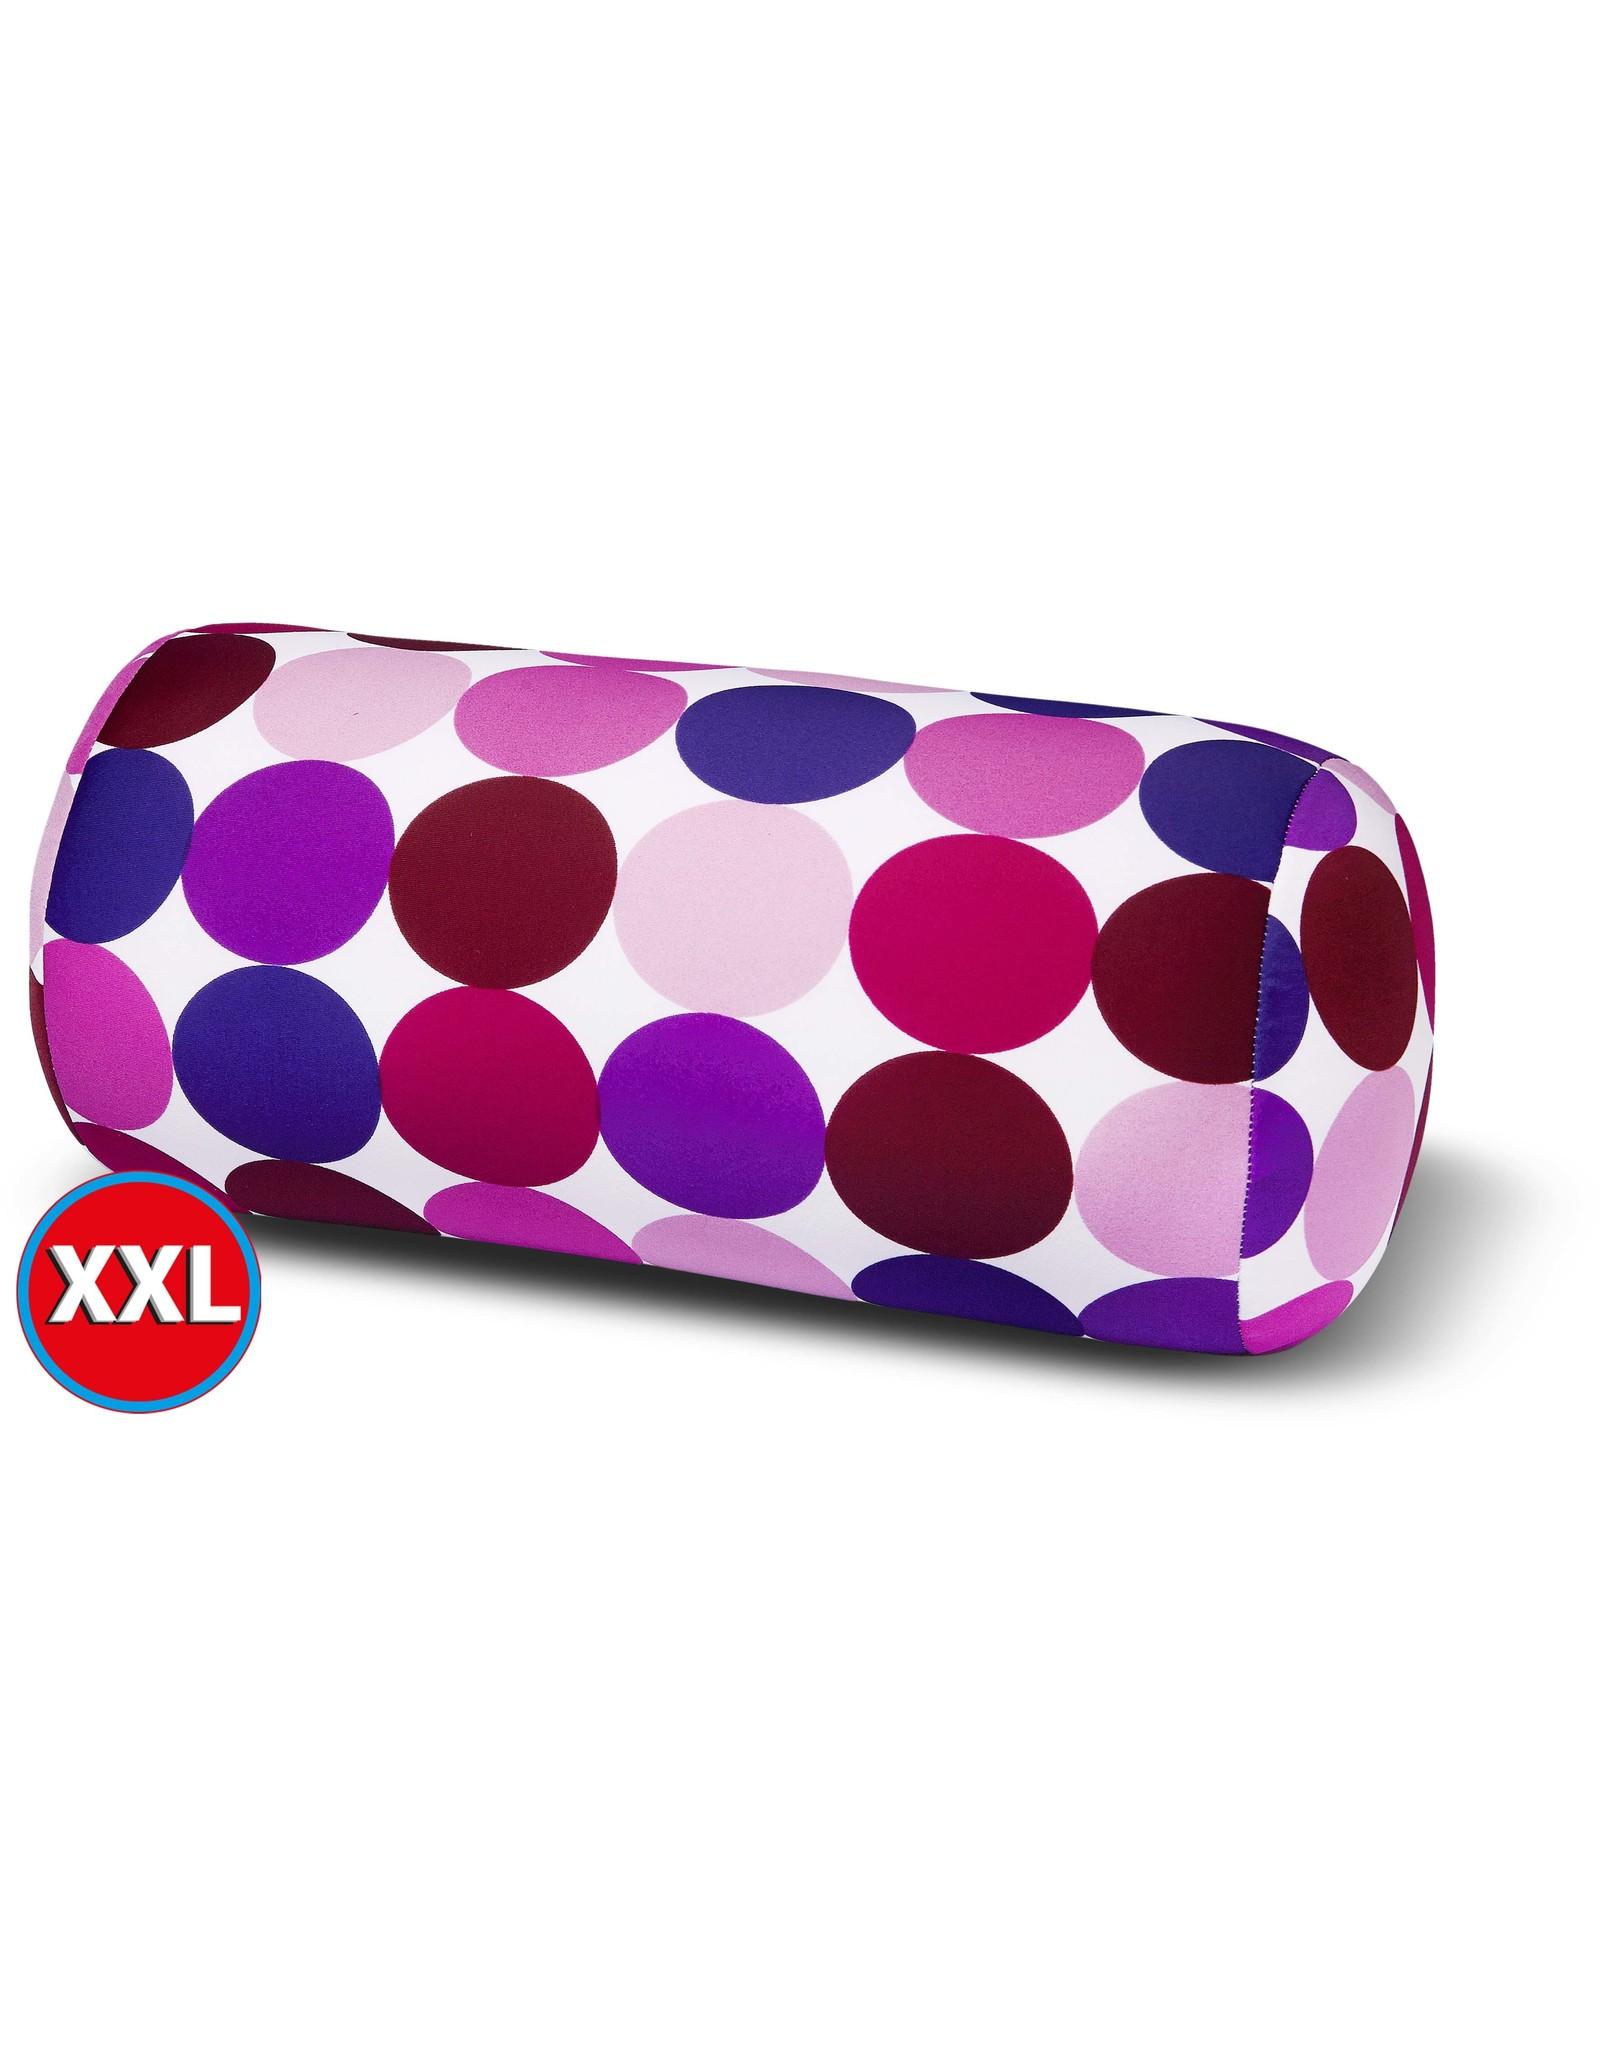 Kuschel-Maxx Kuschel-Maxx - Punkte Violett XXL